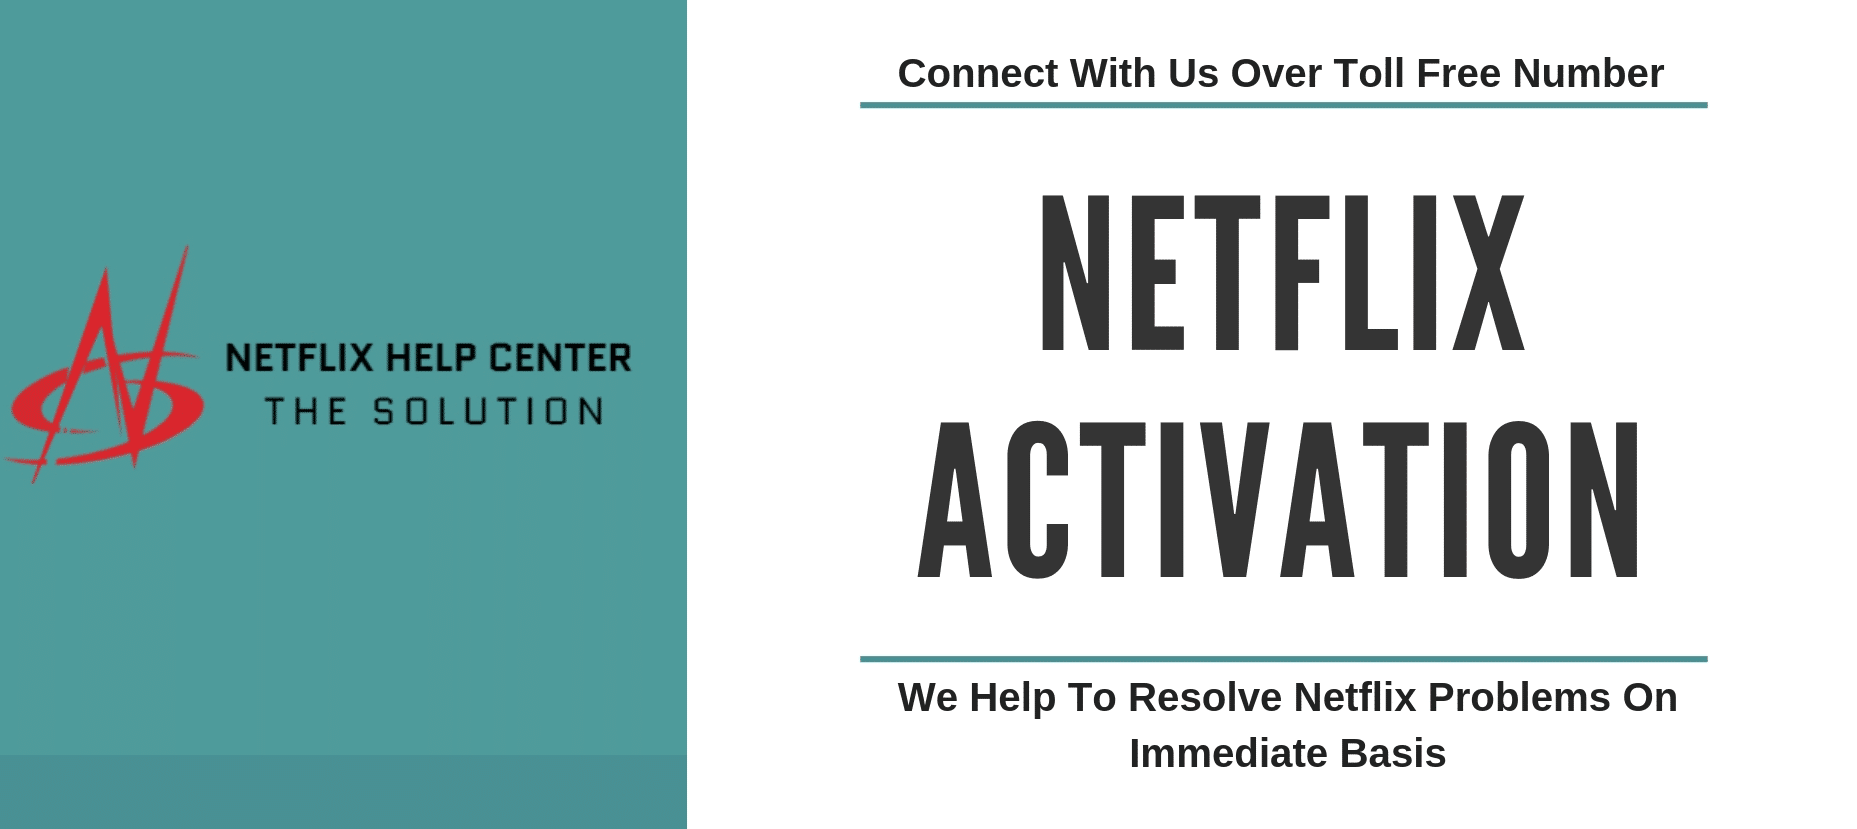 www netflix com activate 1-866-247-0444 www netflix com help